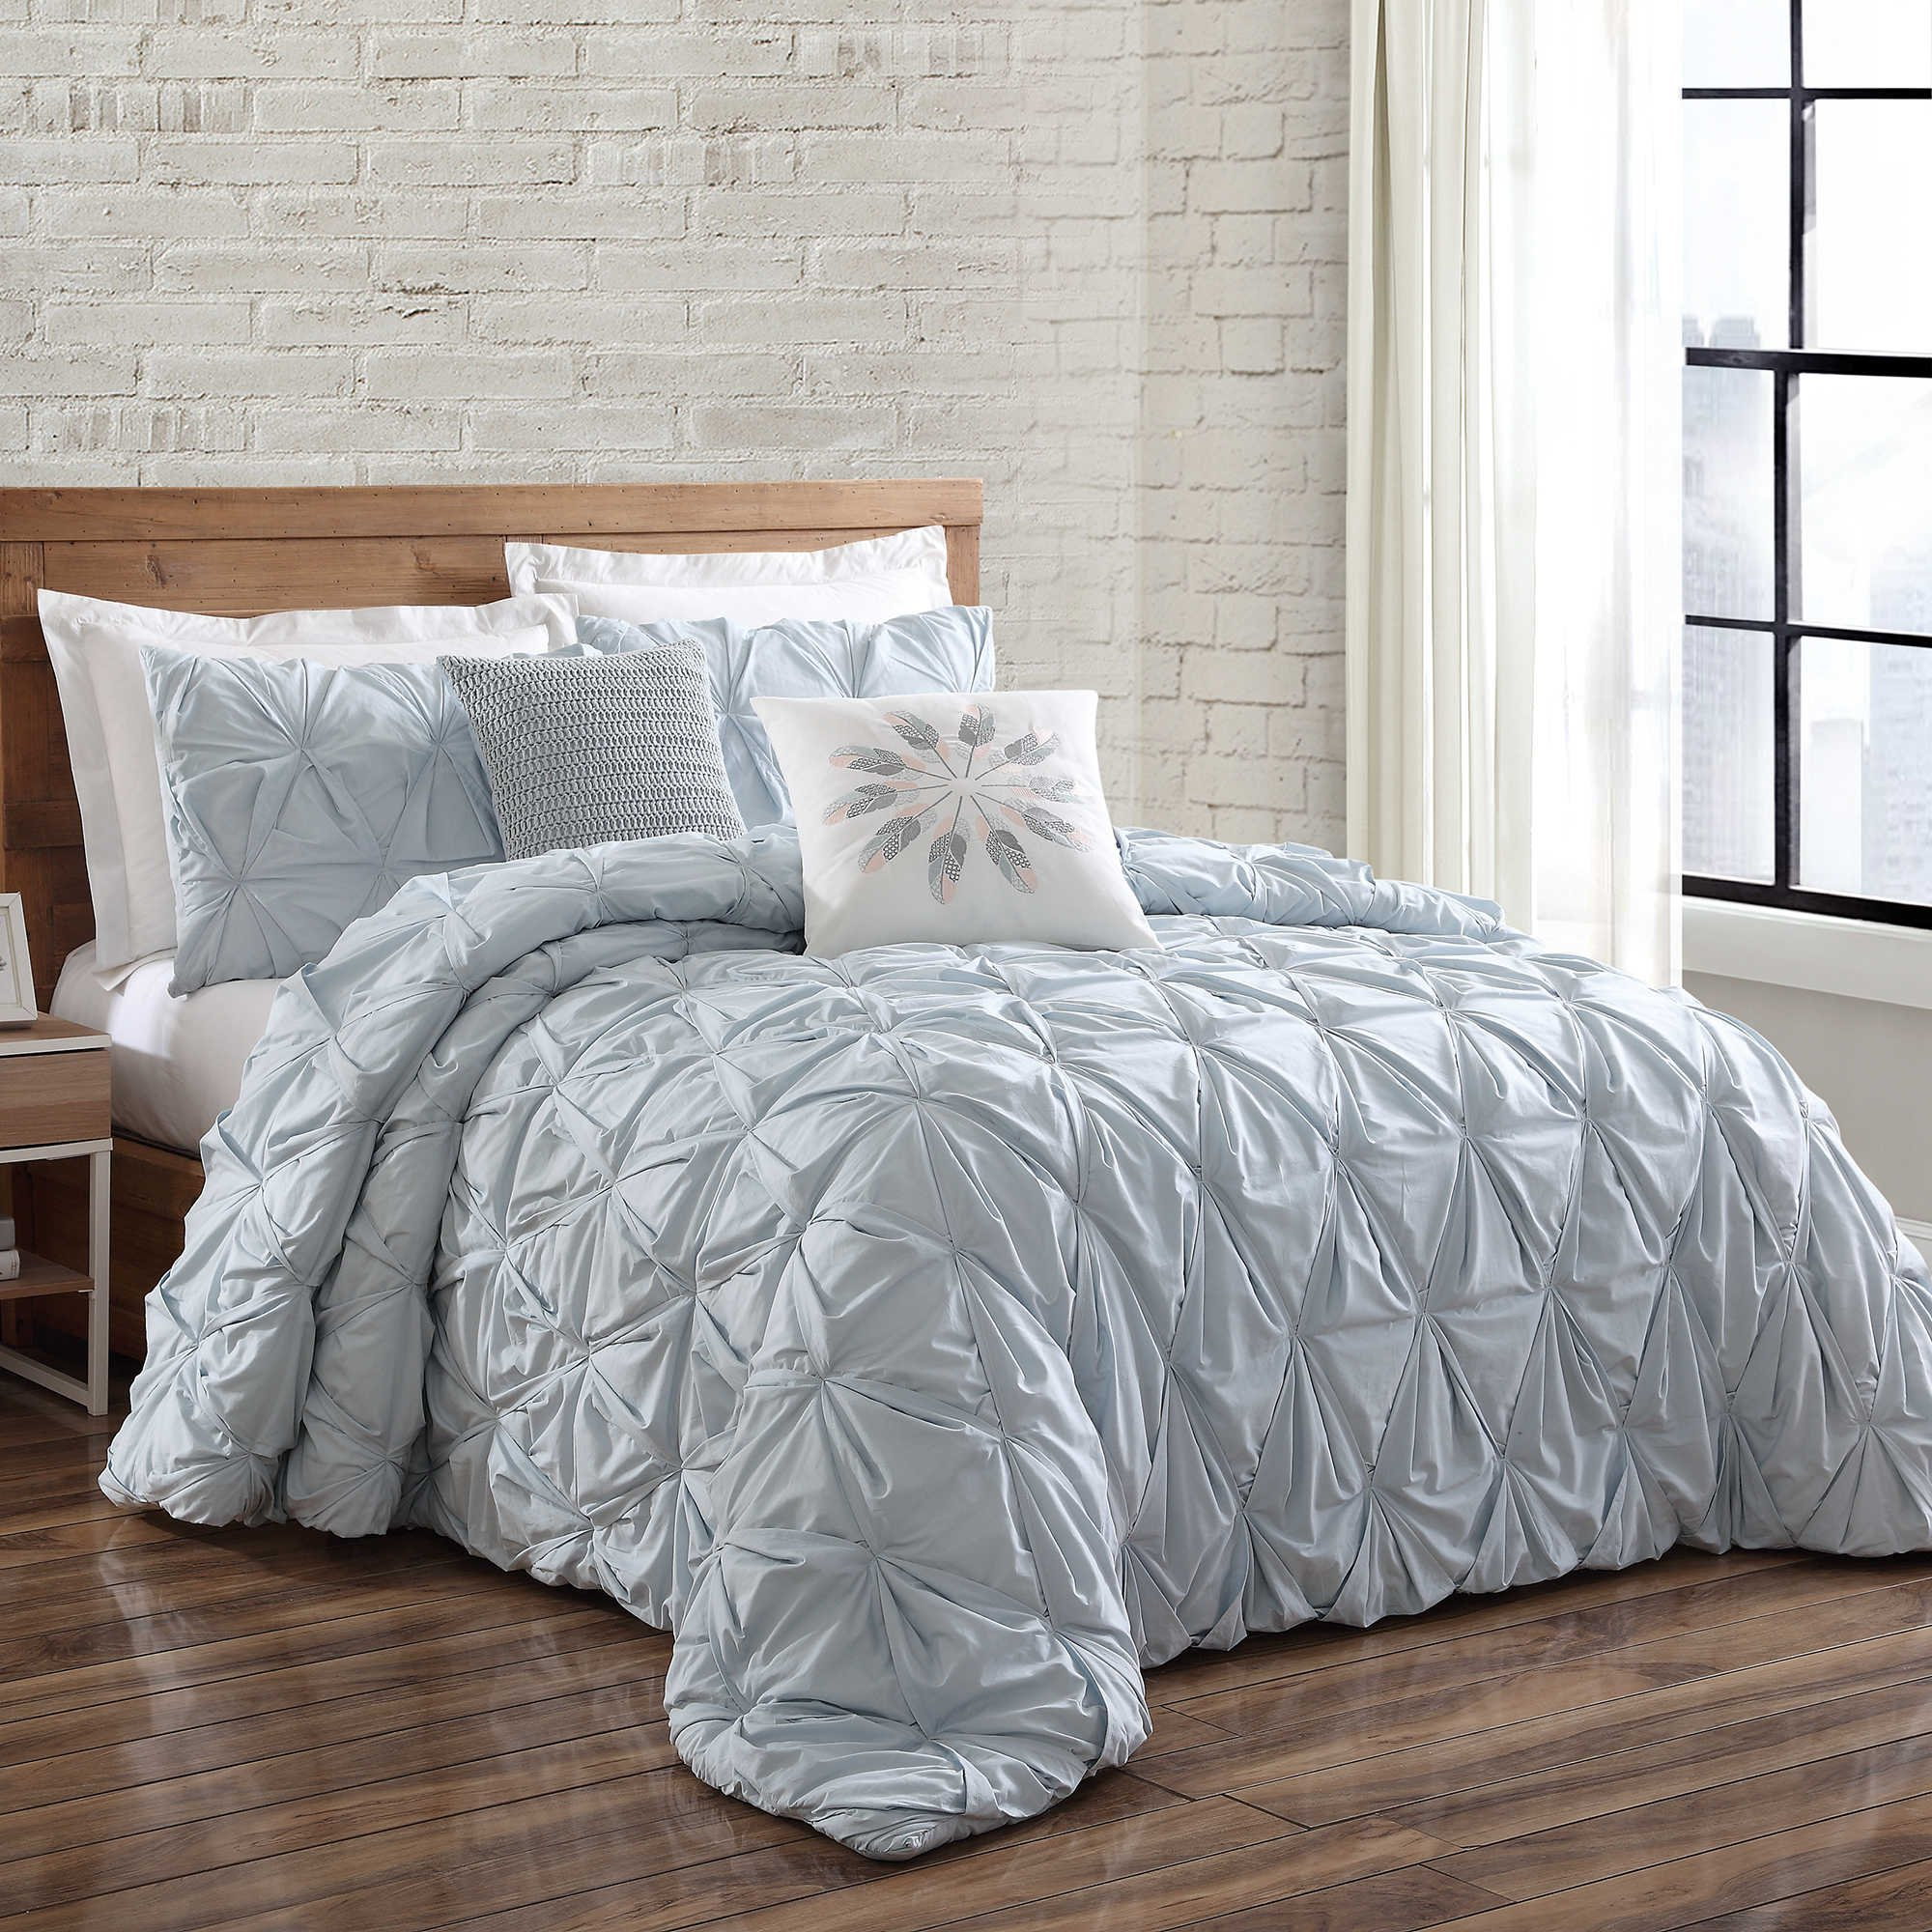 Brooklyn Loom Jackson Pleat Twin Comforter Set in Spa